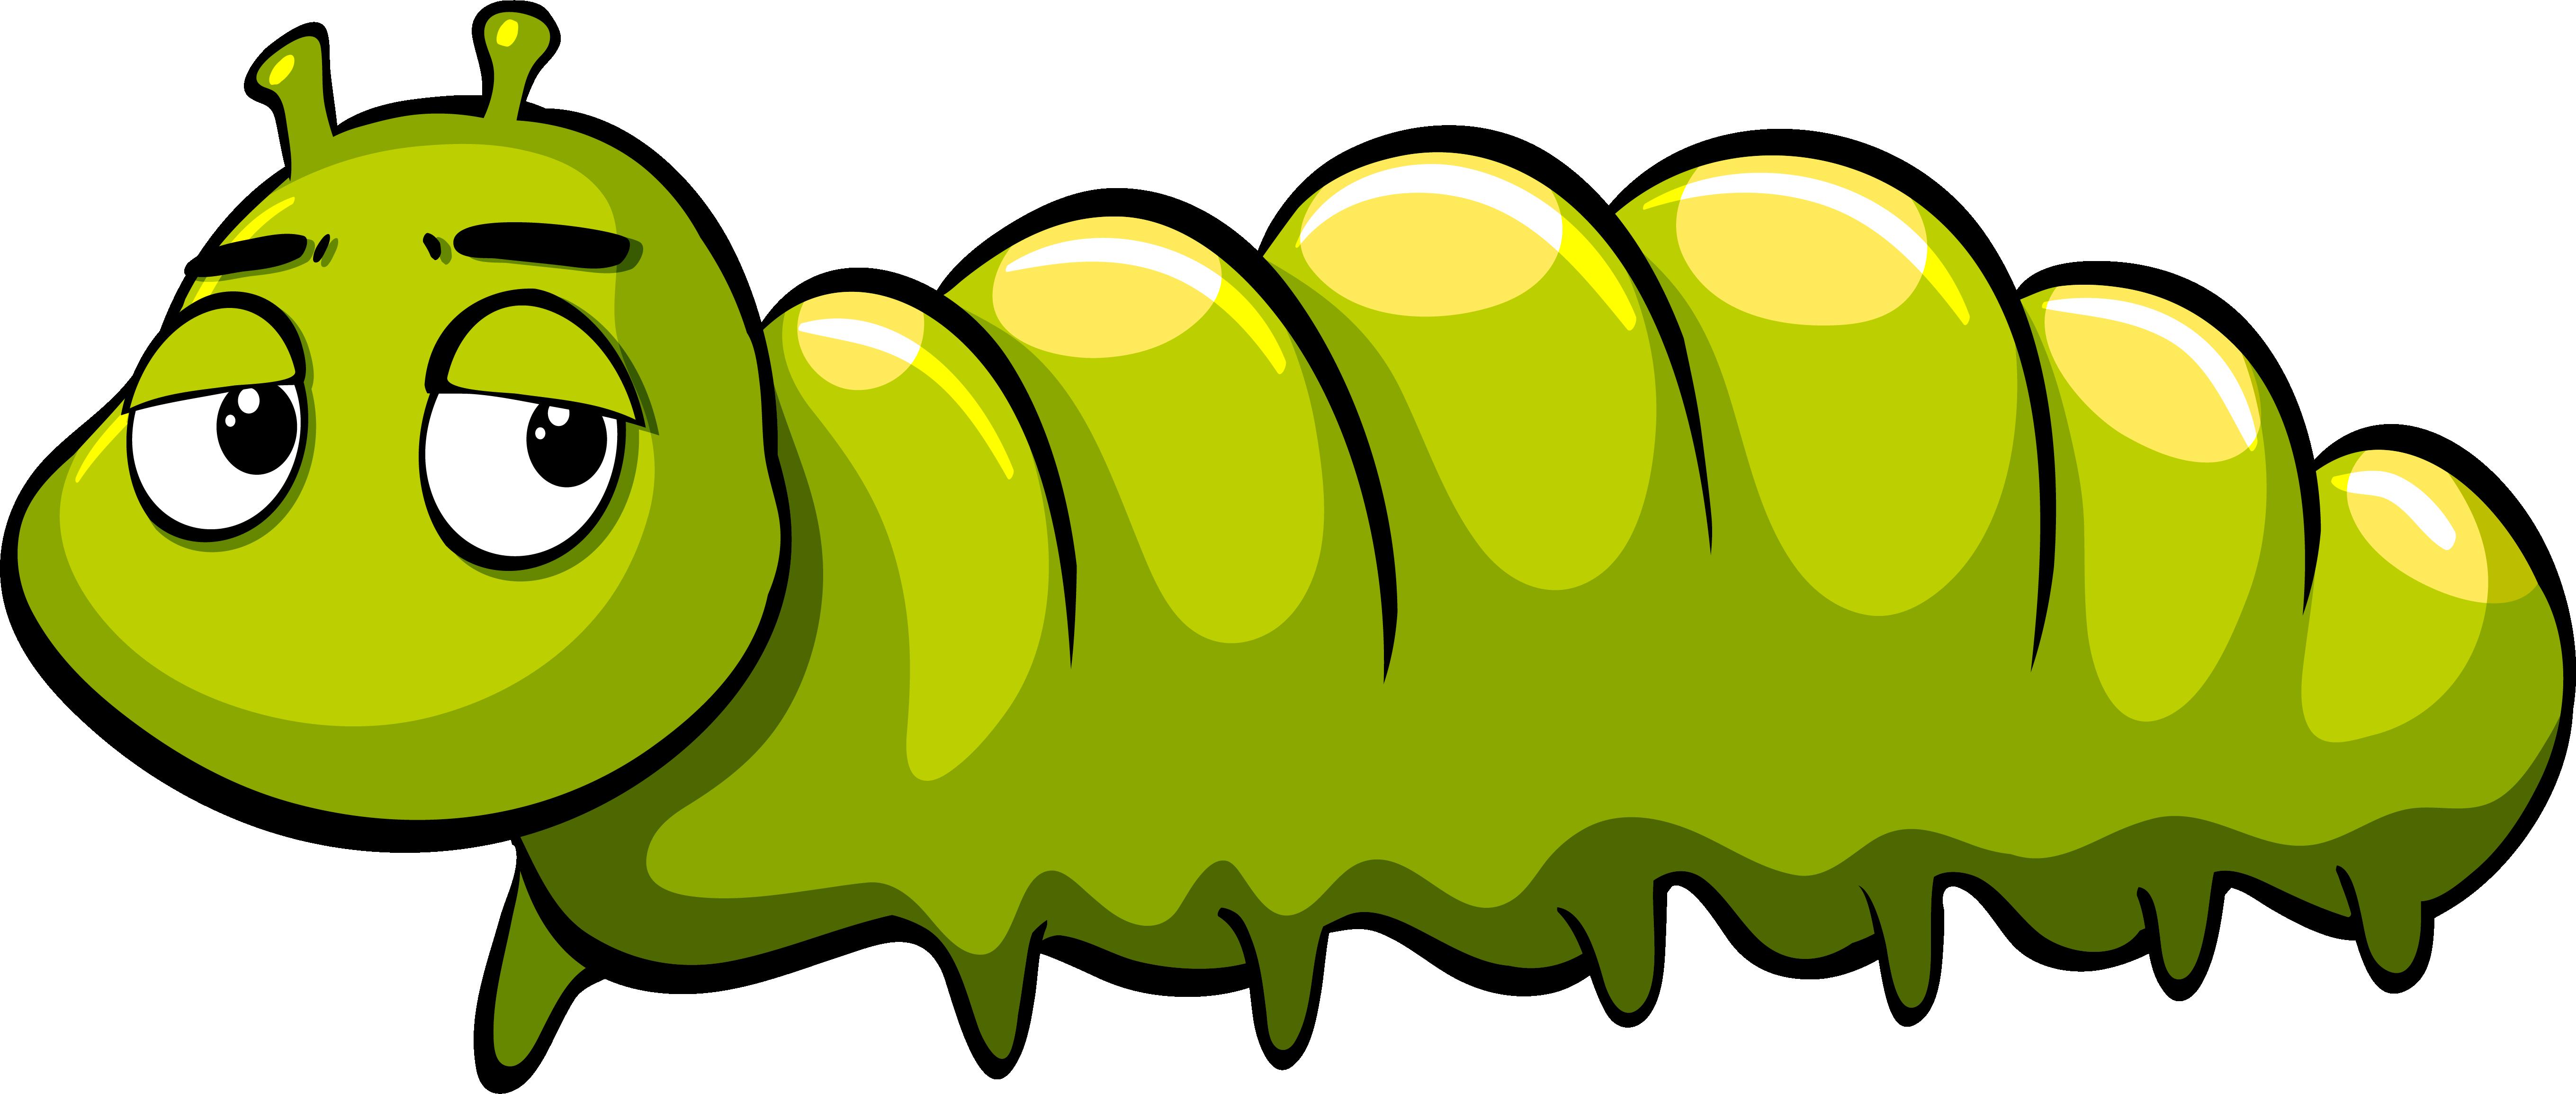 clip art royalty free download Royalty free green cartoon. Caterpillar clipart illustration.